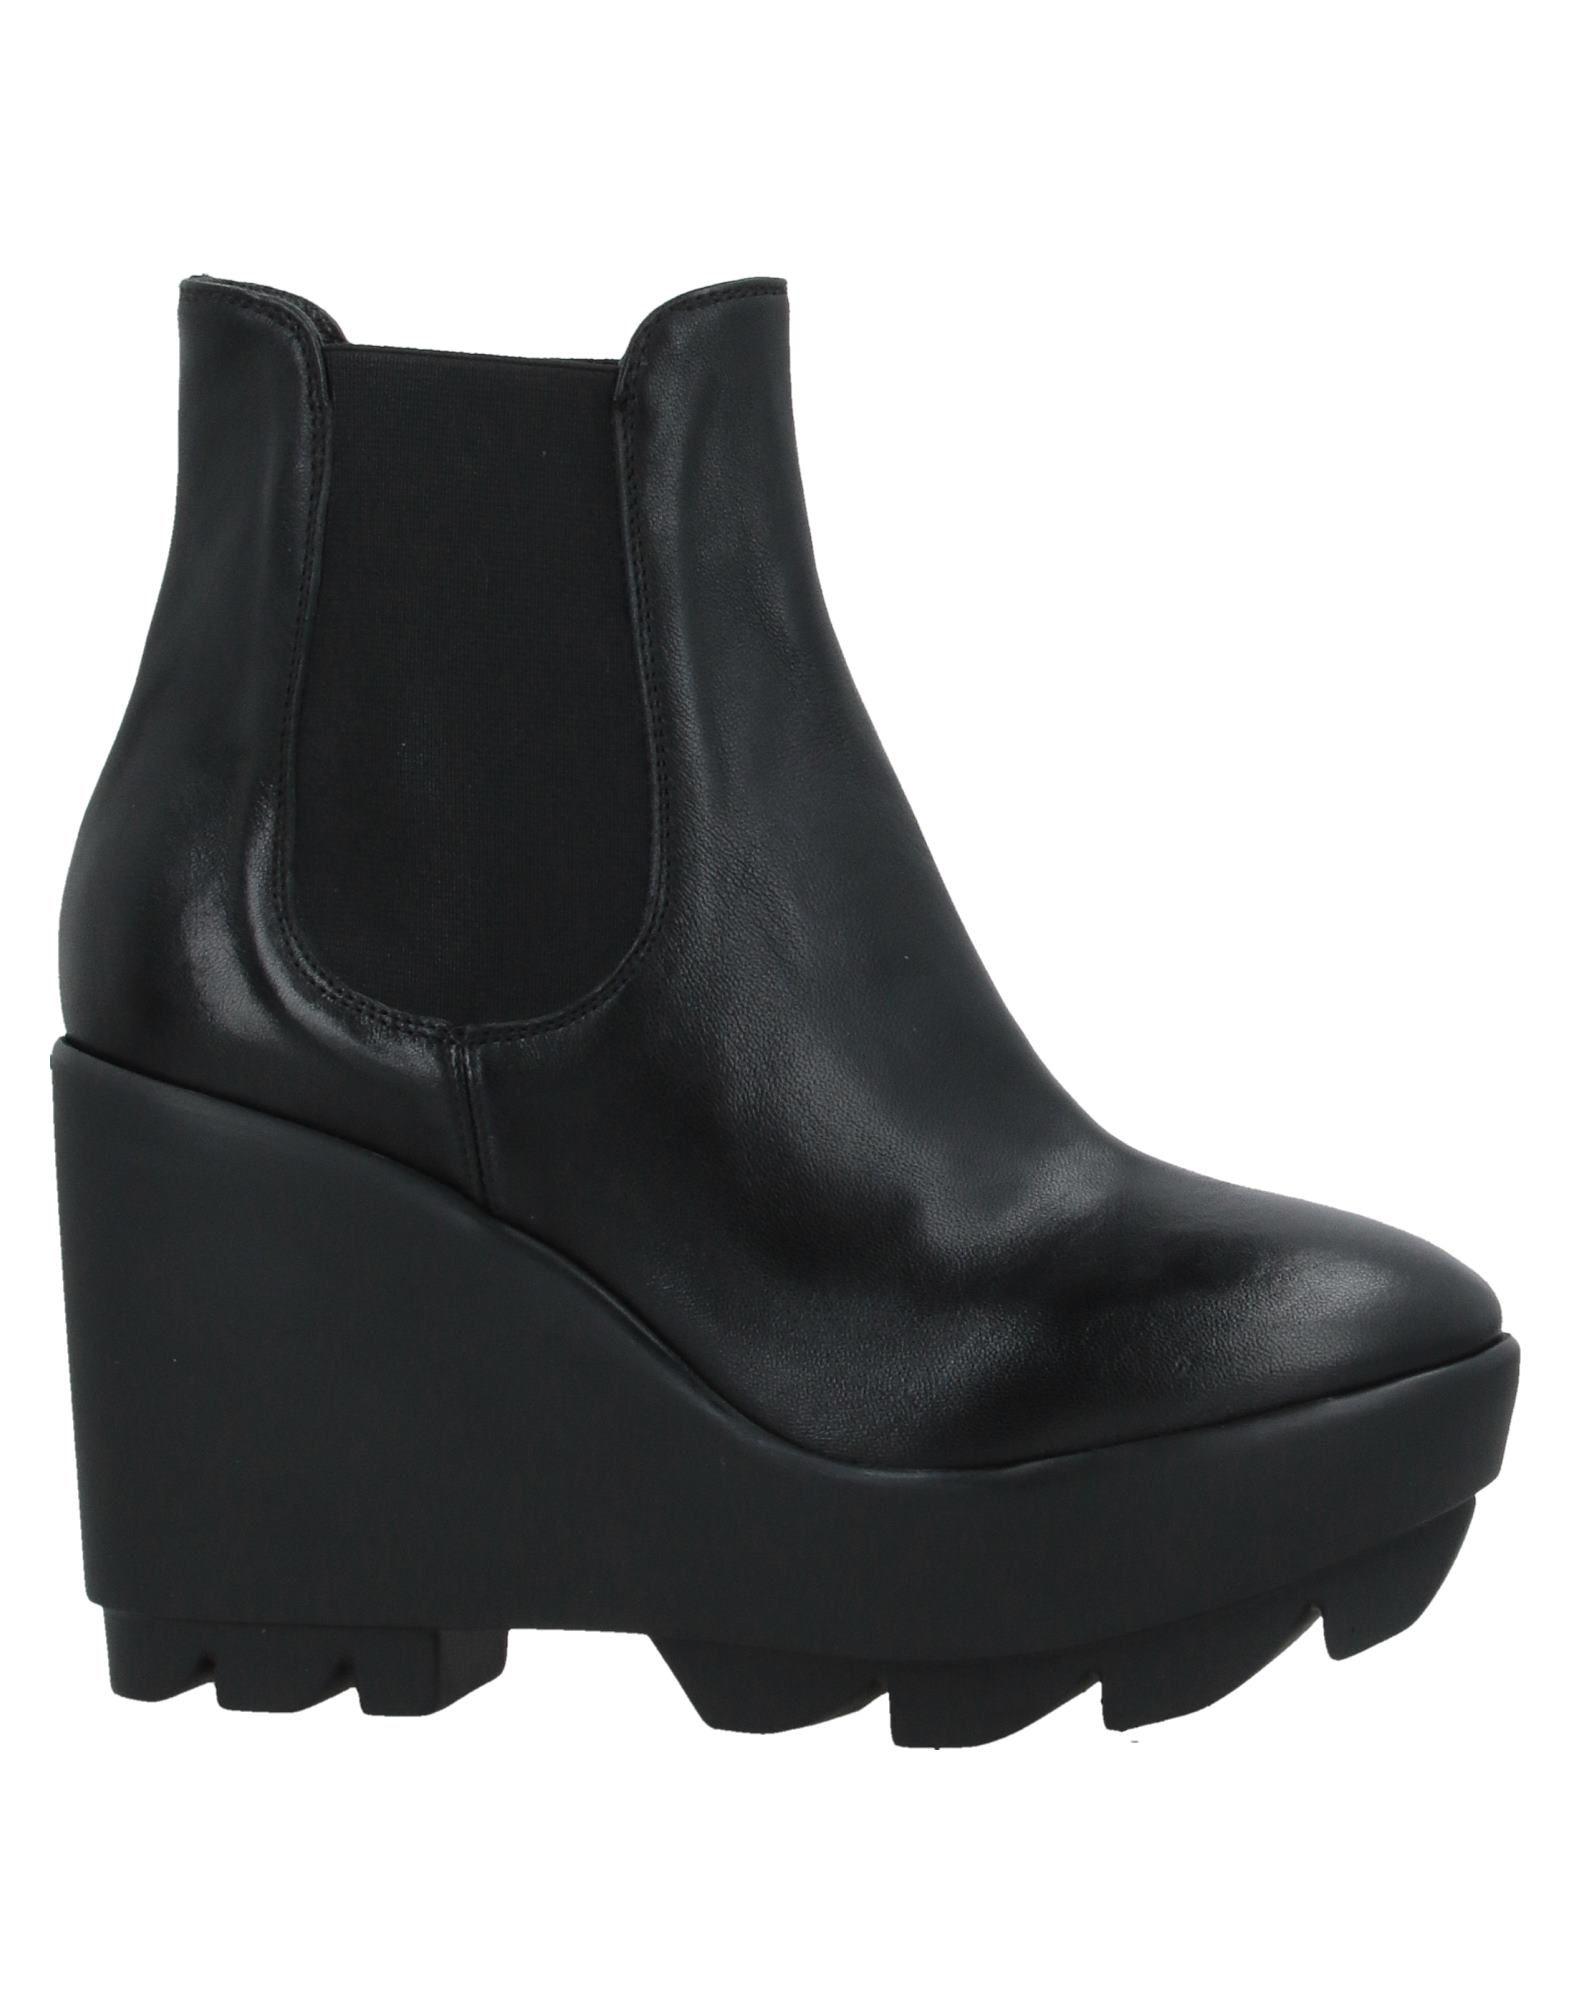 STRATEGIA Полусапоги и высокие ботинки strategia полусапоги и высокие ботинки